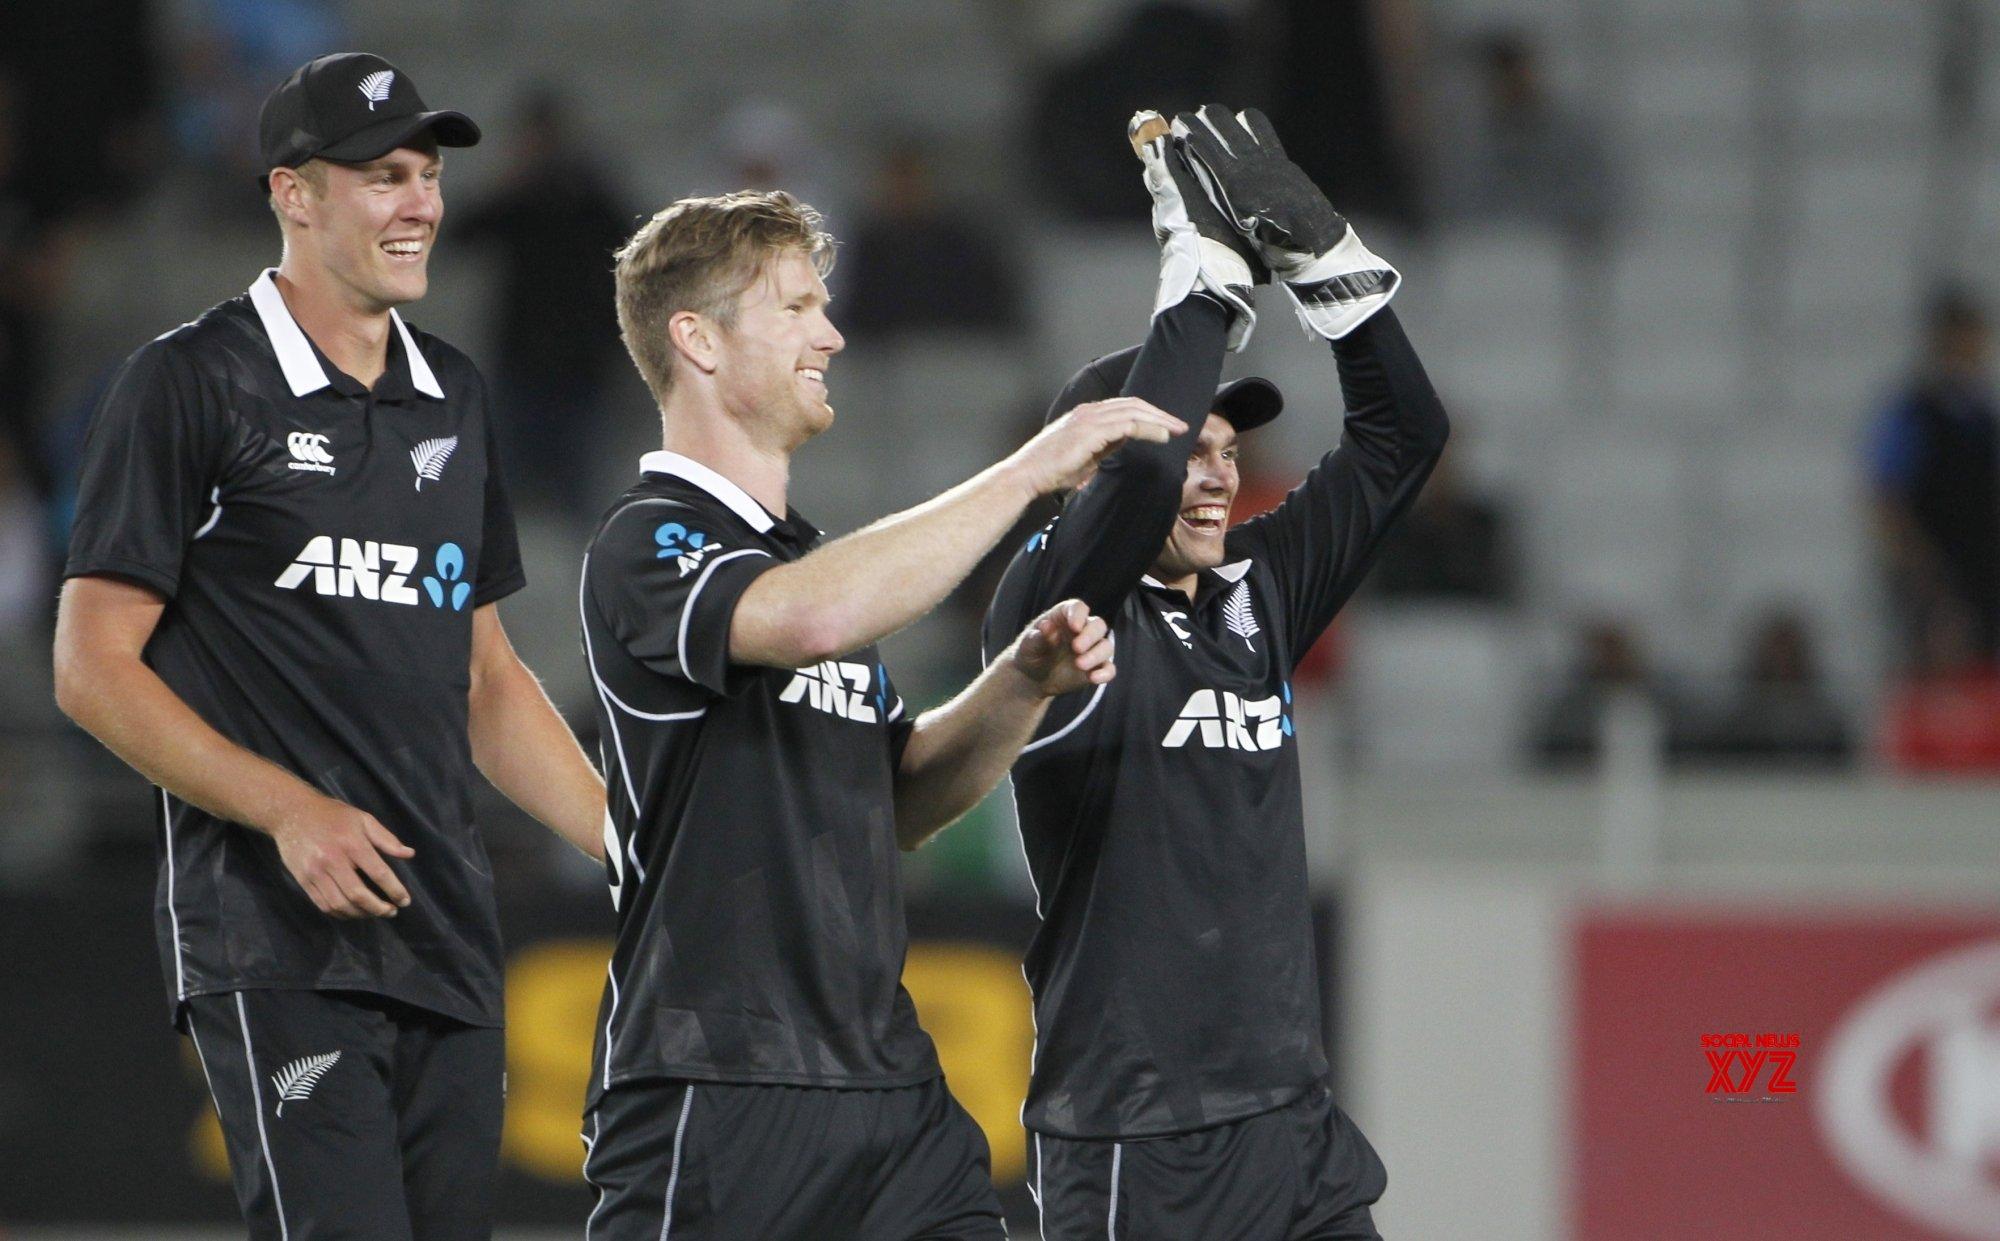 Auckland: 2nd ODI - India Vs New Zealand (Batch - 17) #Gallery